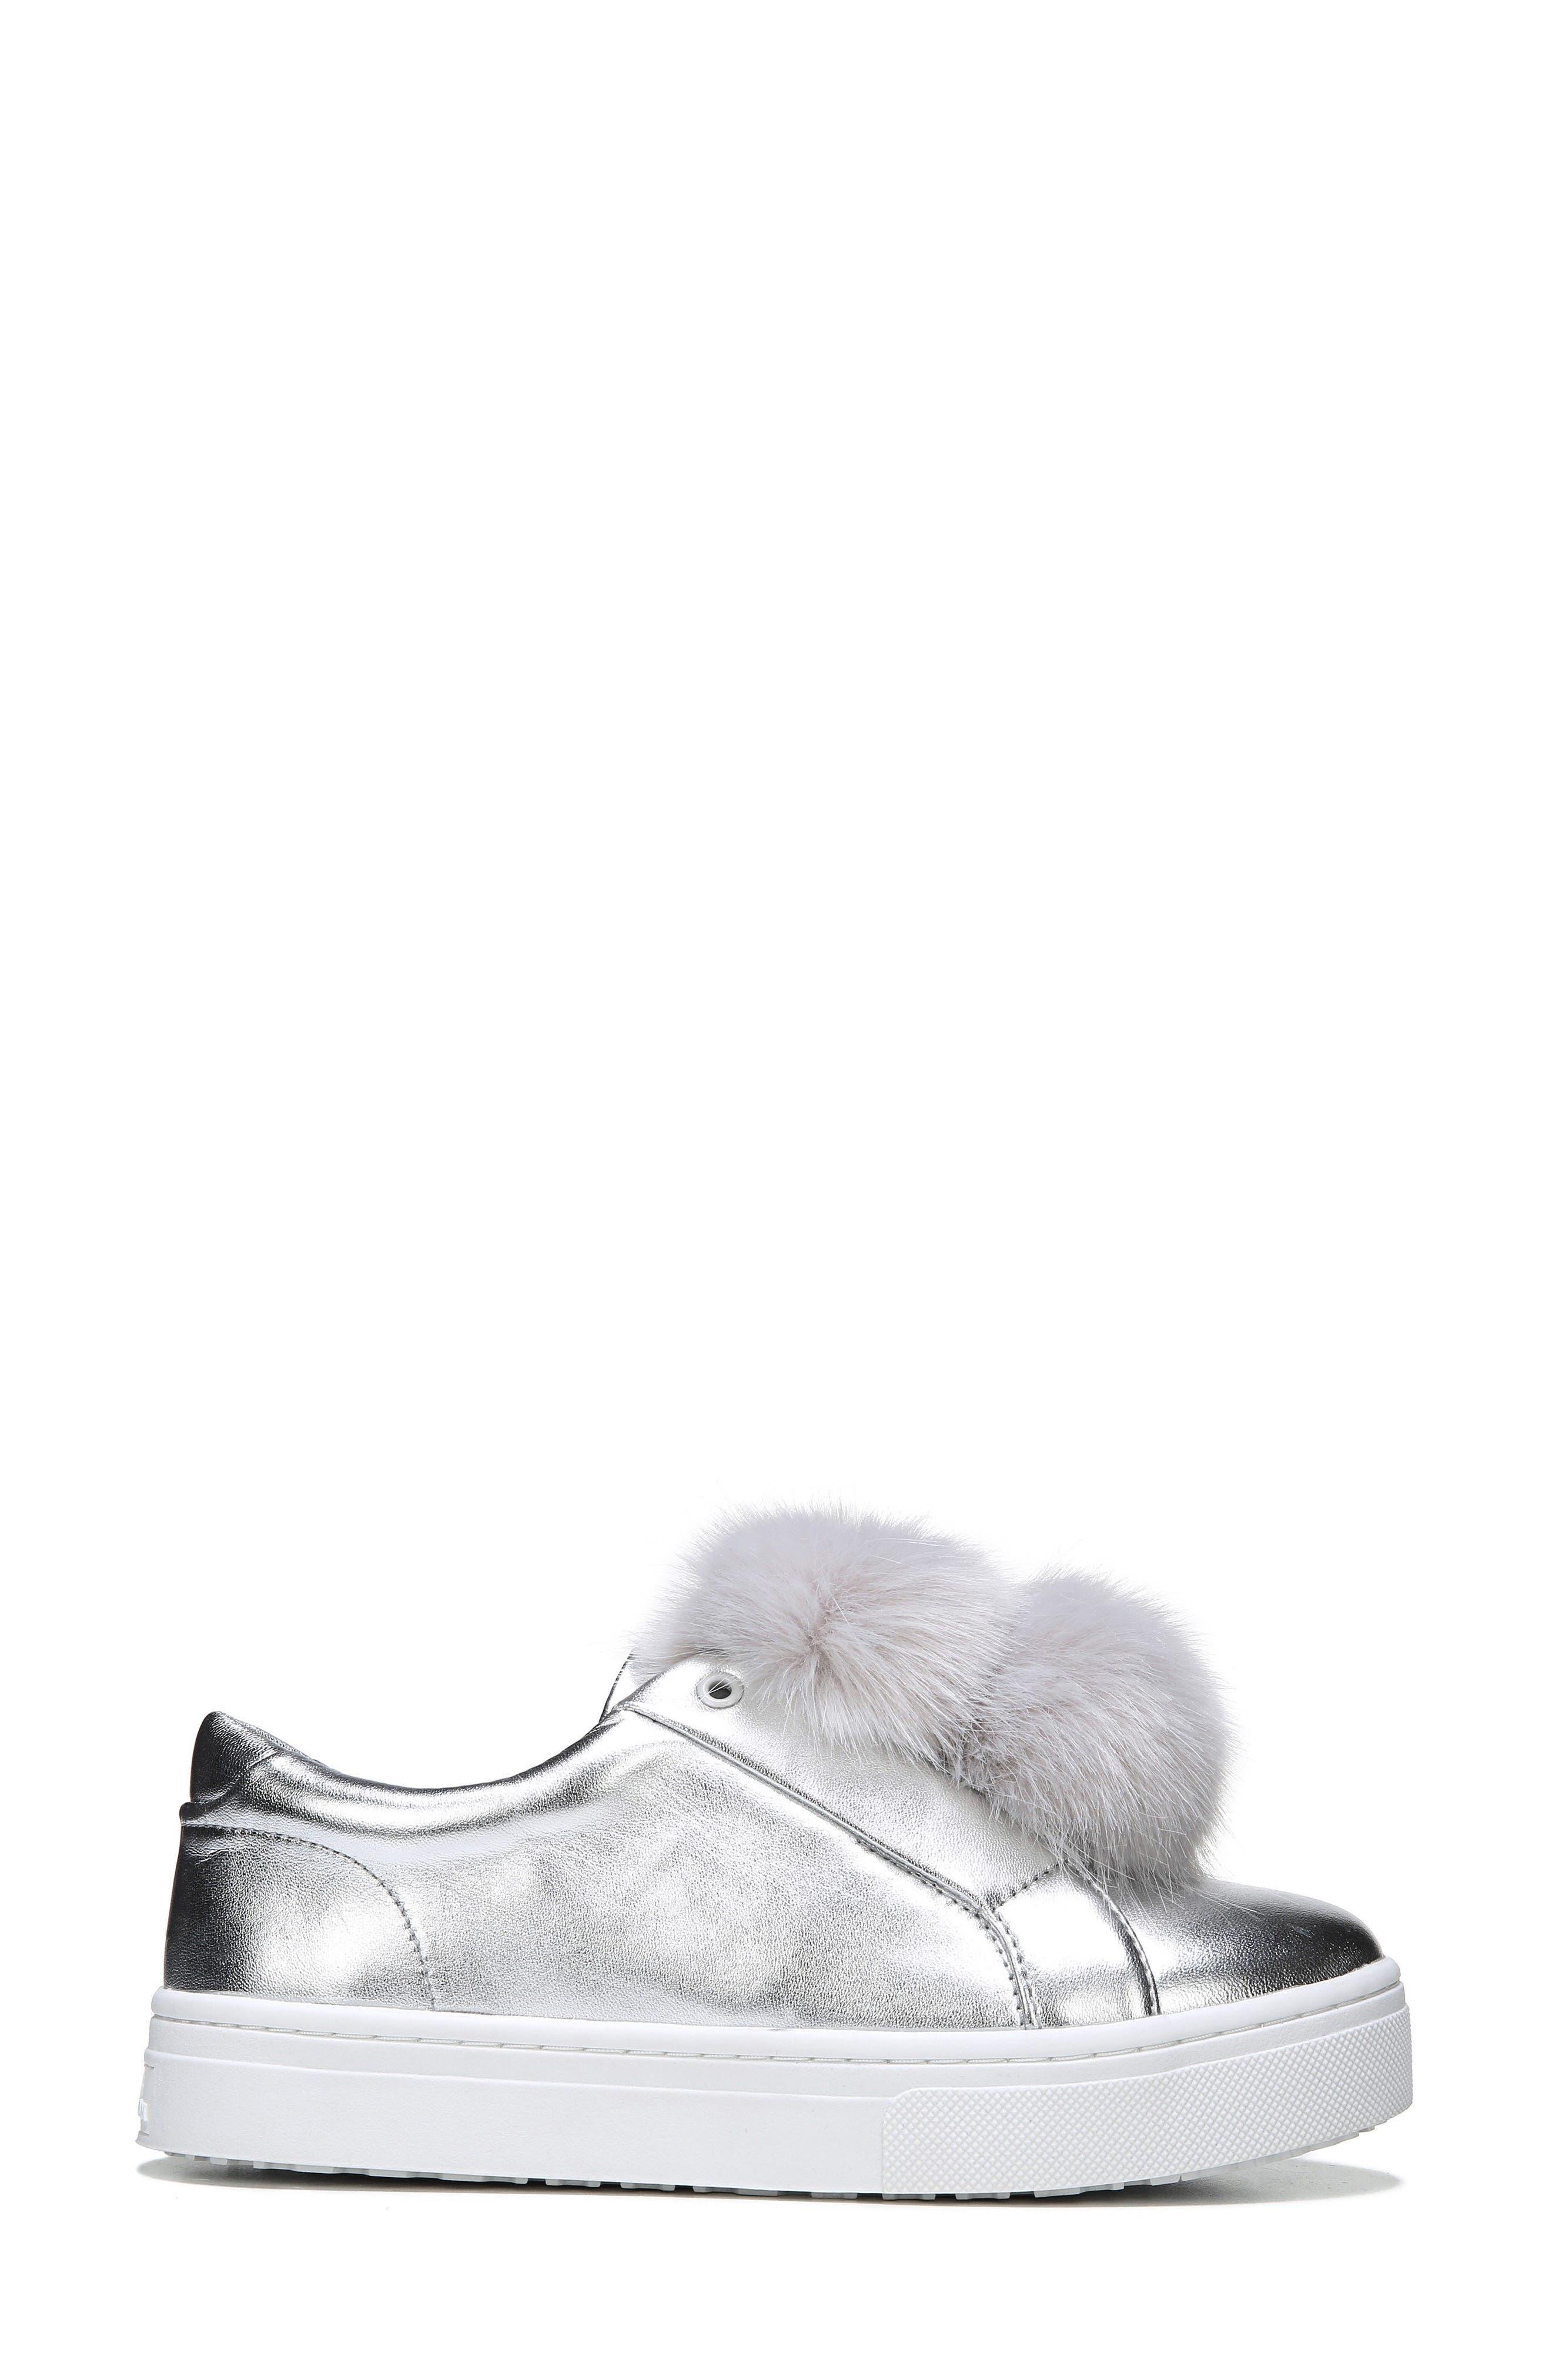 Alternate Image 3  - Sam Edelman 'Leya' Faux Fur Laceless Sneaker (Women)